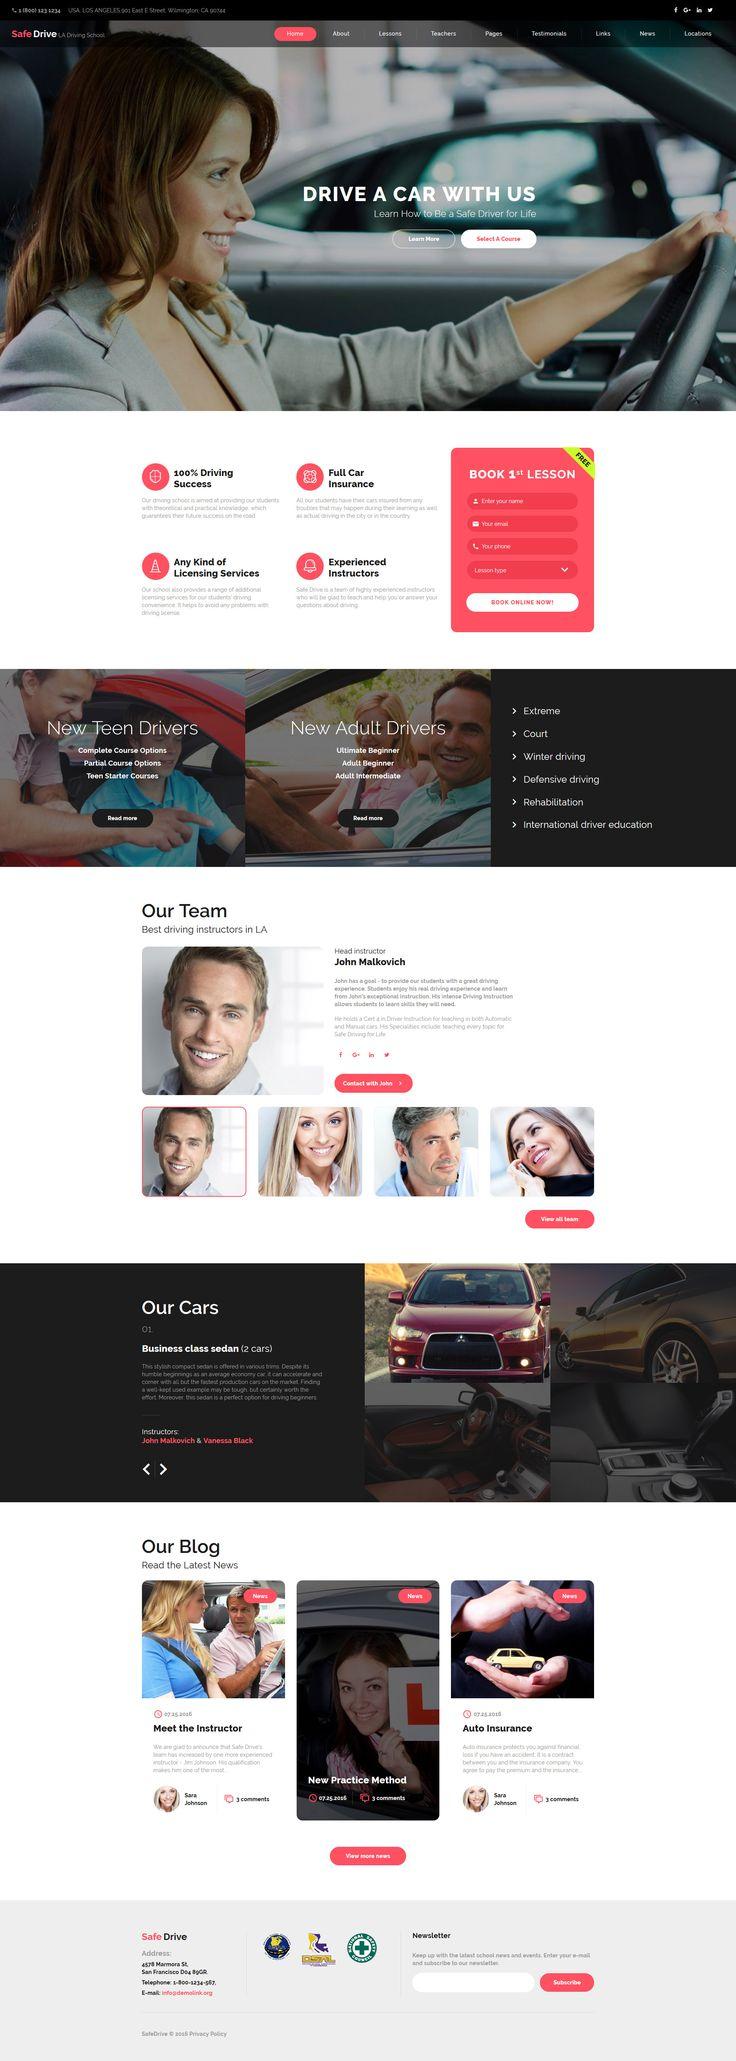 Traffic School Responsive Website Template - https://www.templatemonster.com/website-templates/traffic-school-responsive-website-template-61124.html